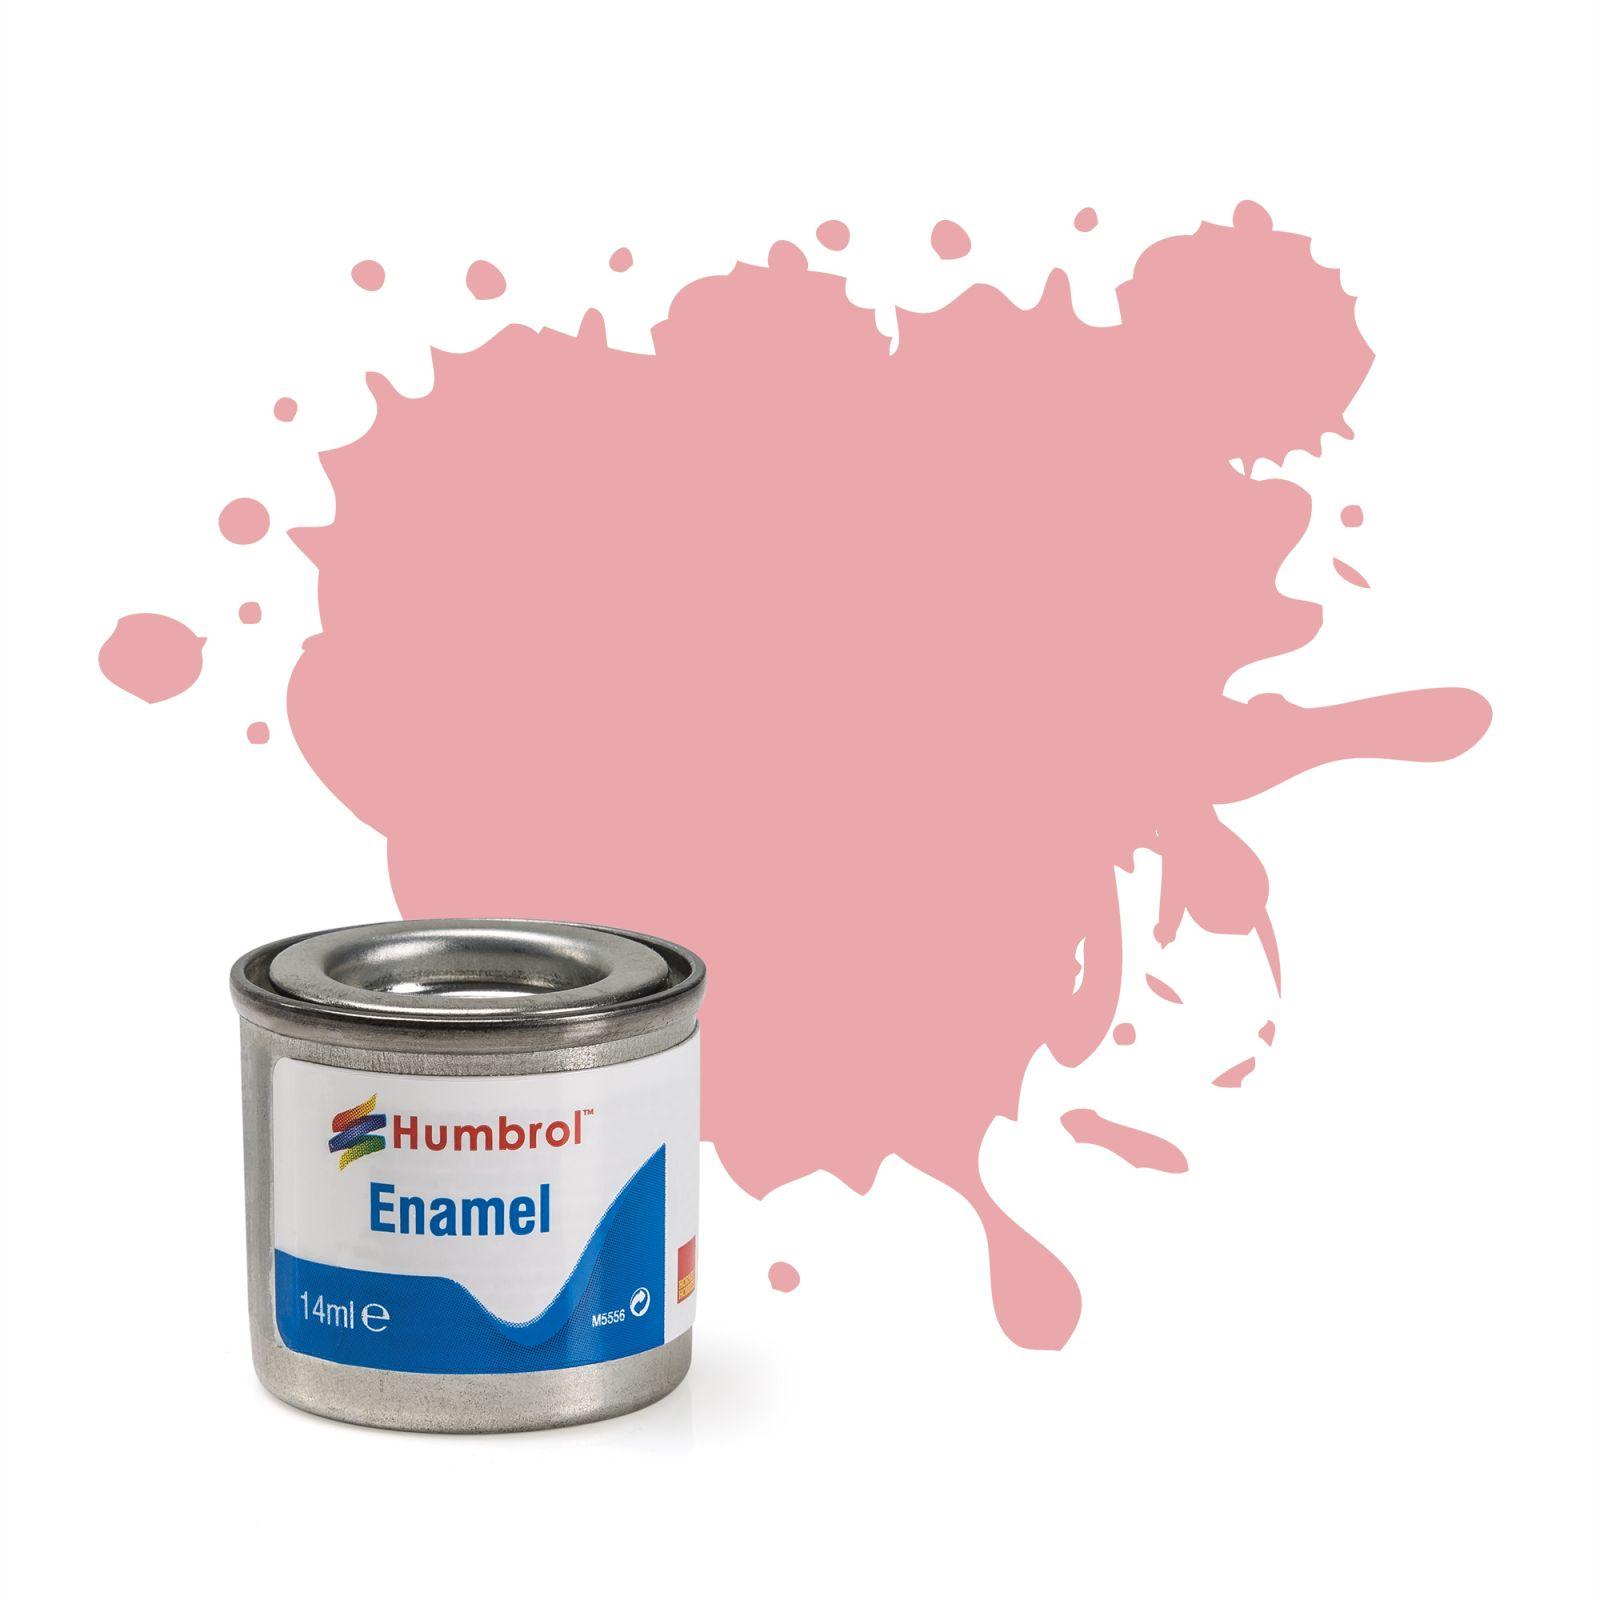 Humbrol barva email AA0057 - N0 57 Pastel Pink - Matt - 14ml Plastikové modely